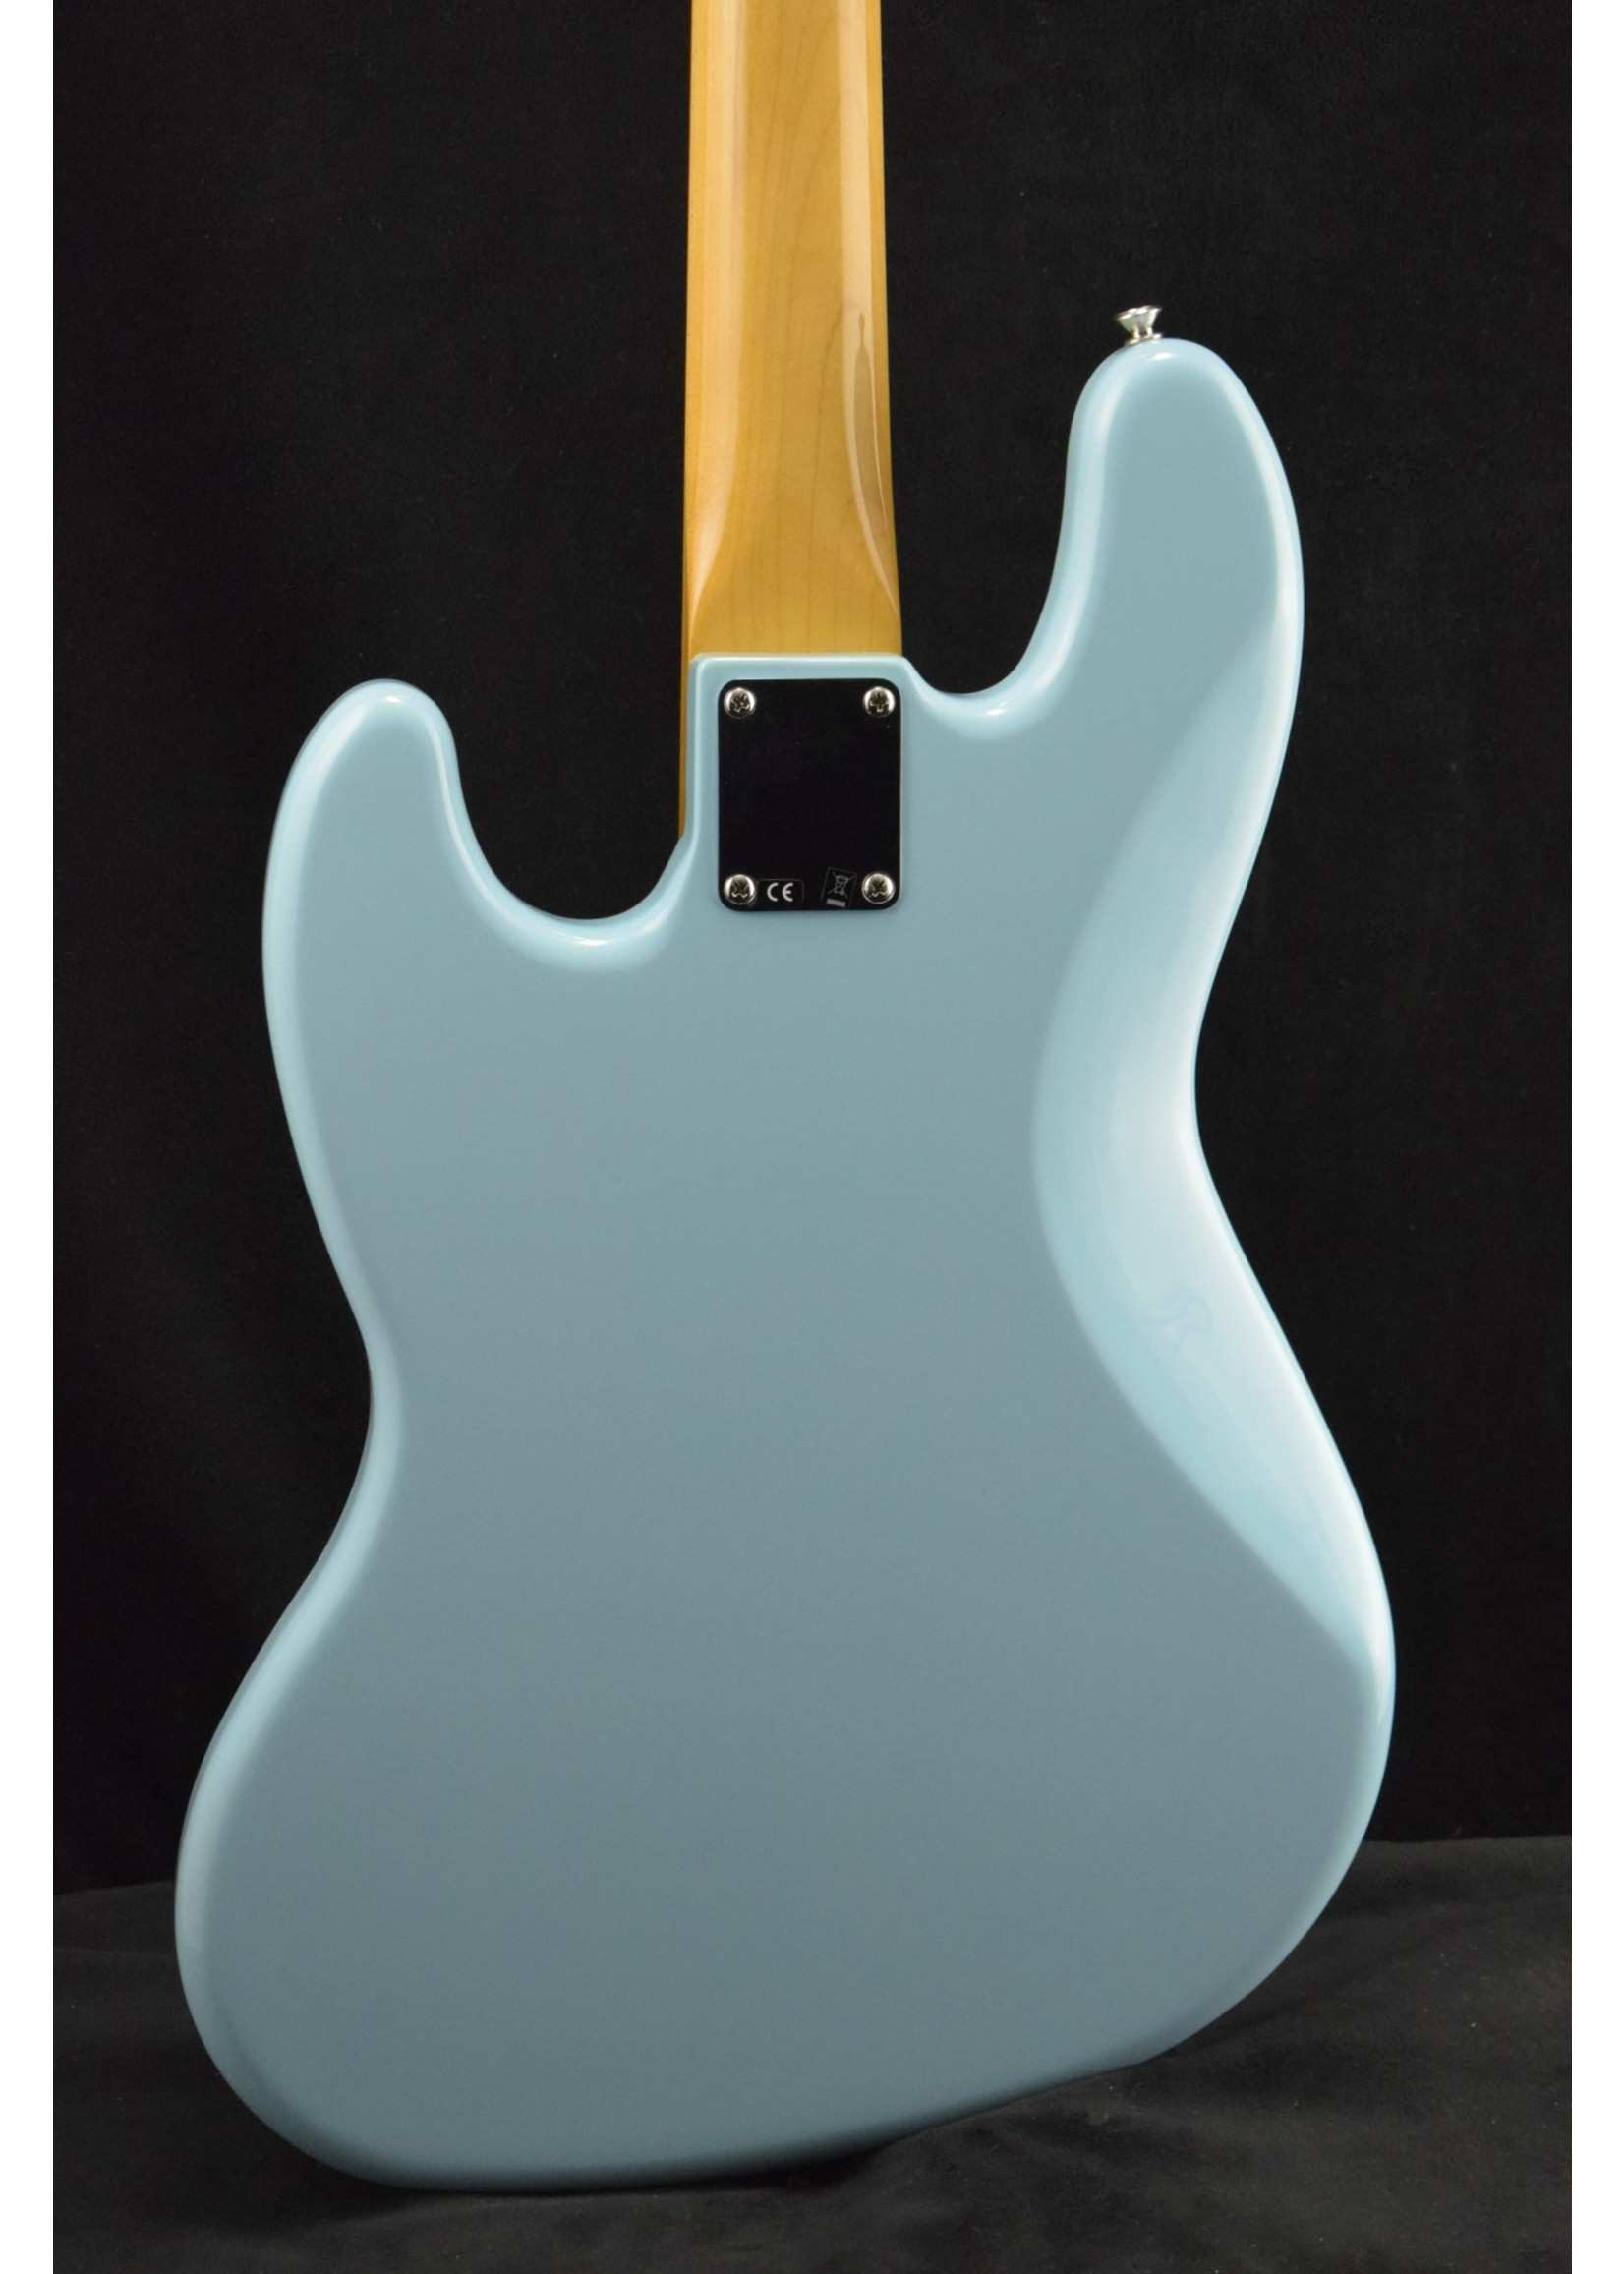 Fender Fender Vintera '60s Jazz Bass Daphne Blue